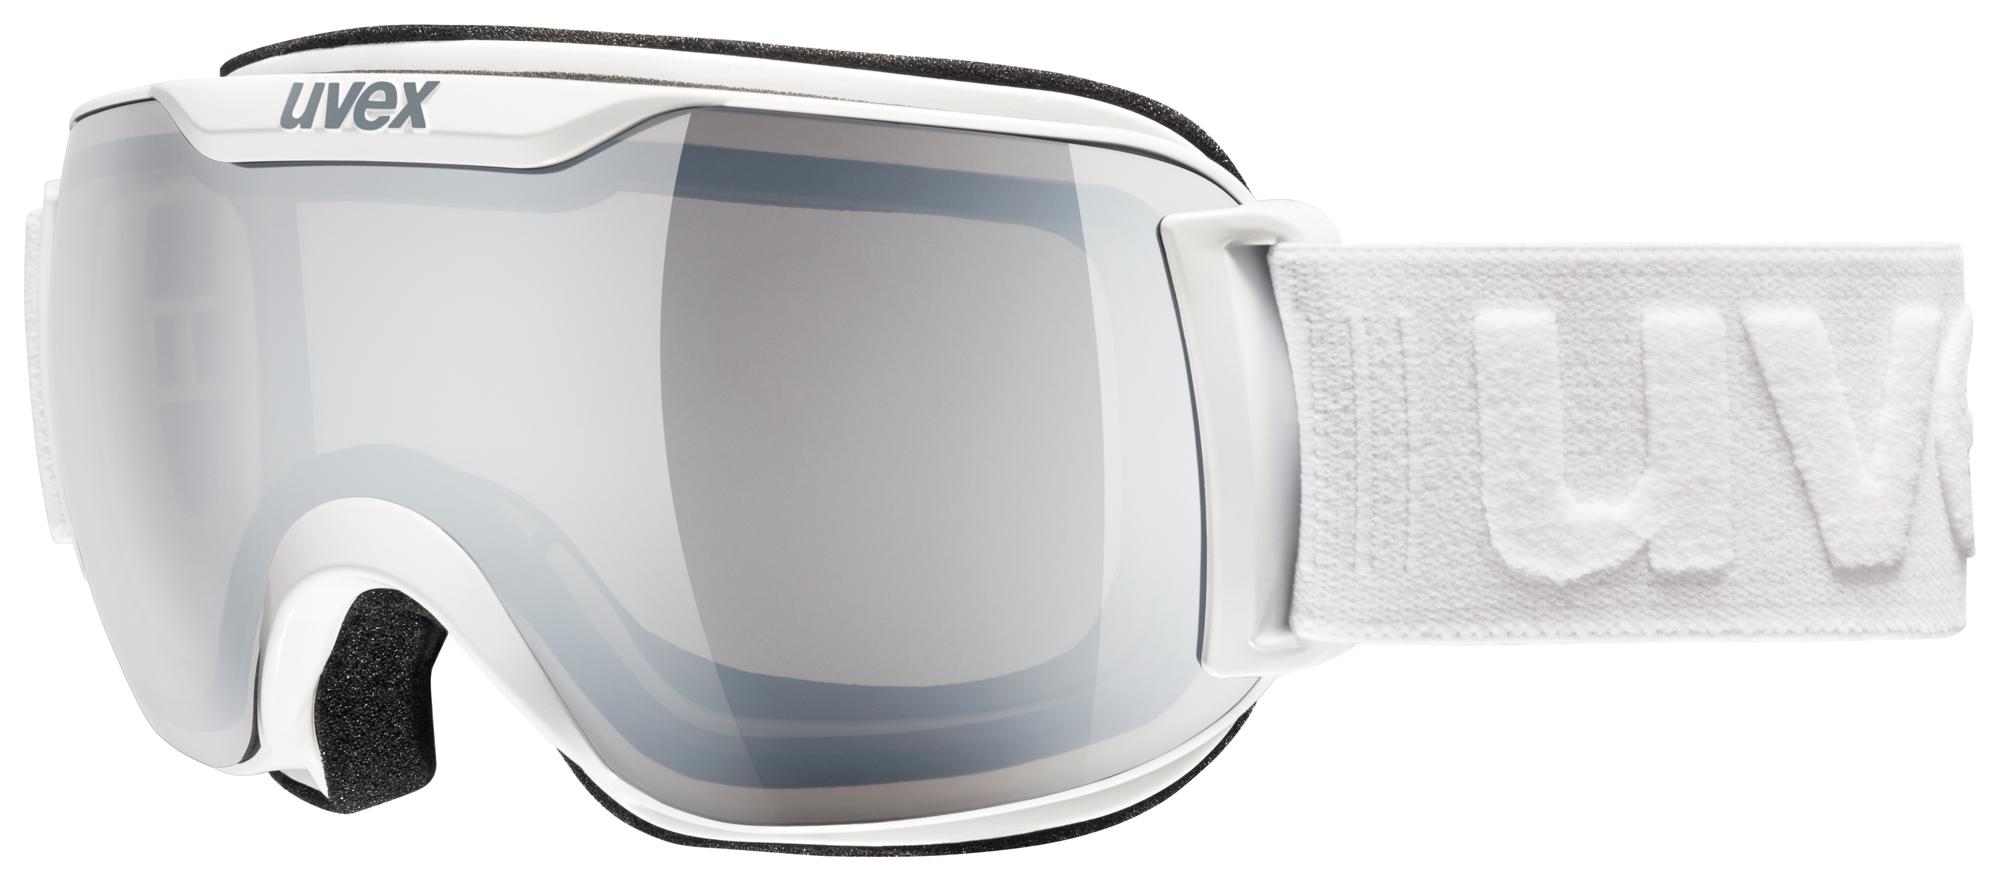 UVEX DOWNHILL 2000 S LM, white/ltm silver S5504381026